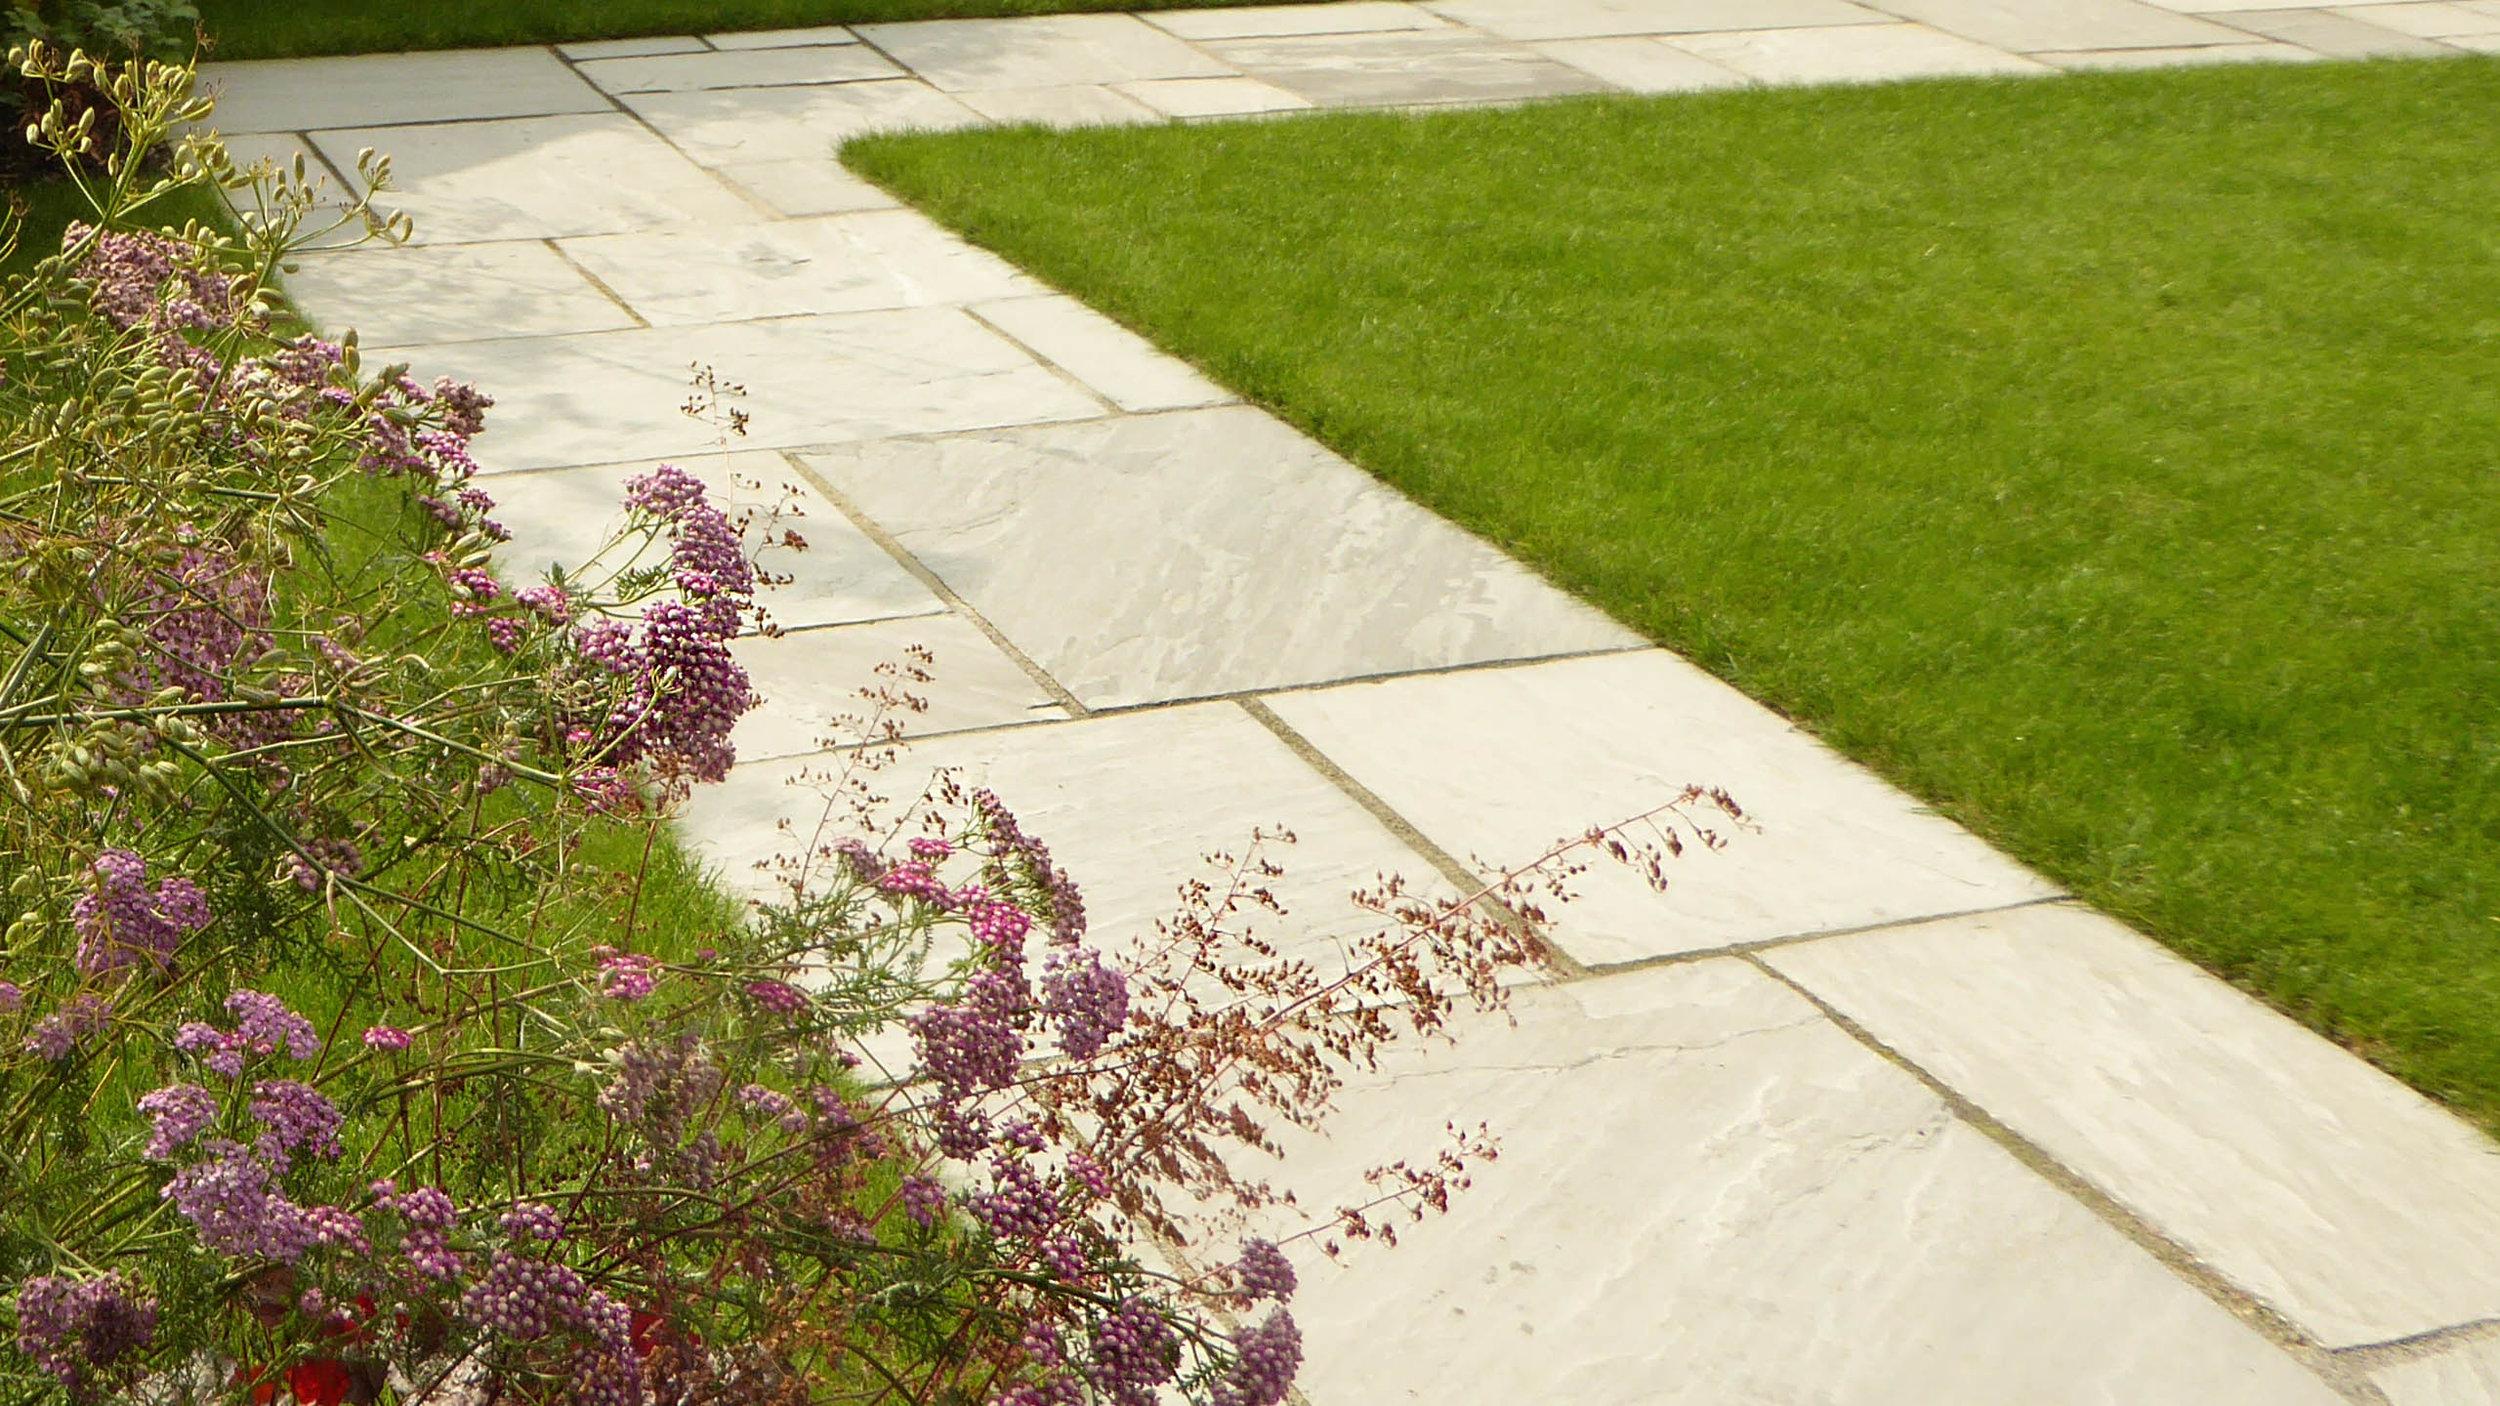 gardendesignbillinge (29).jpg